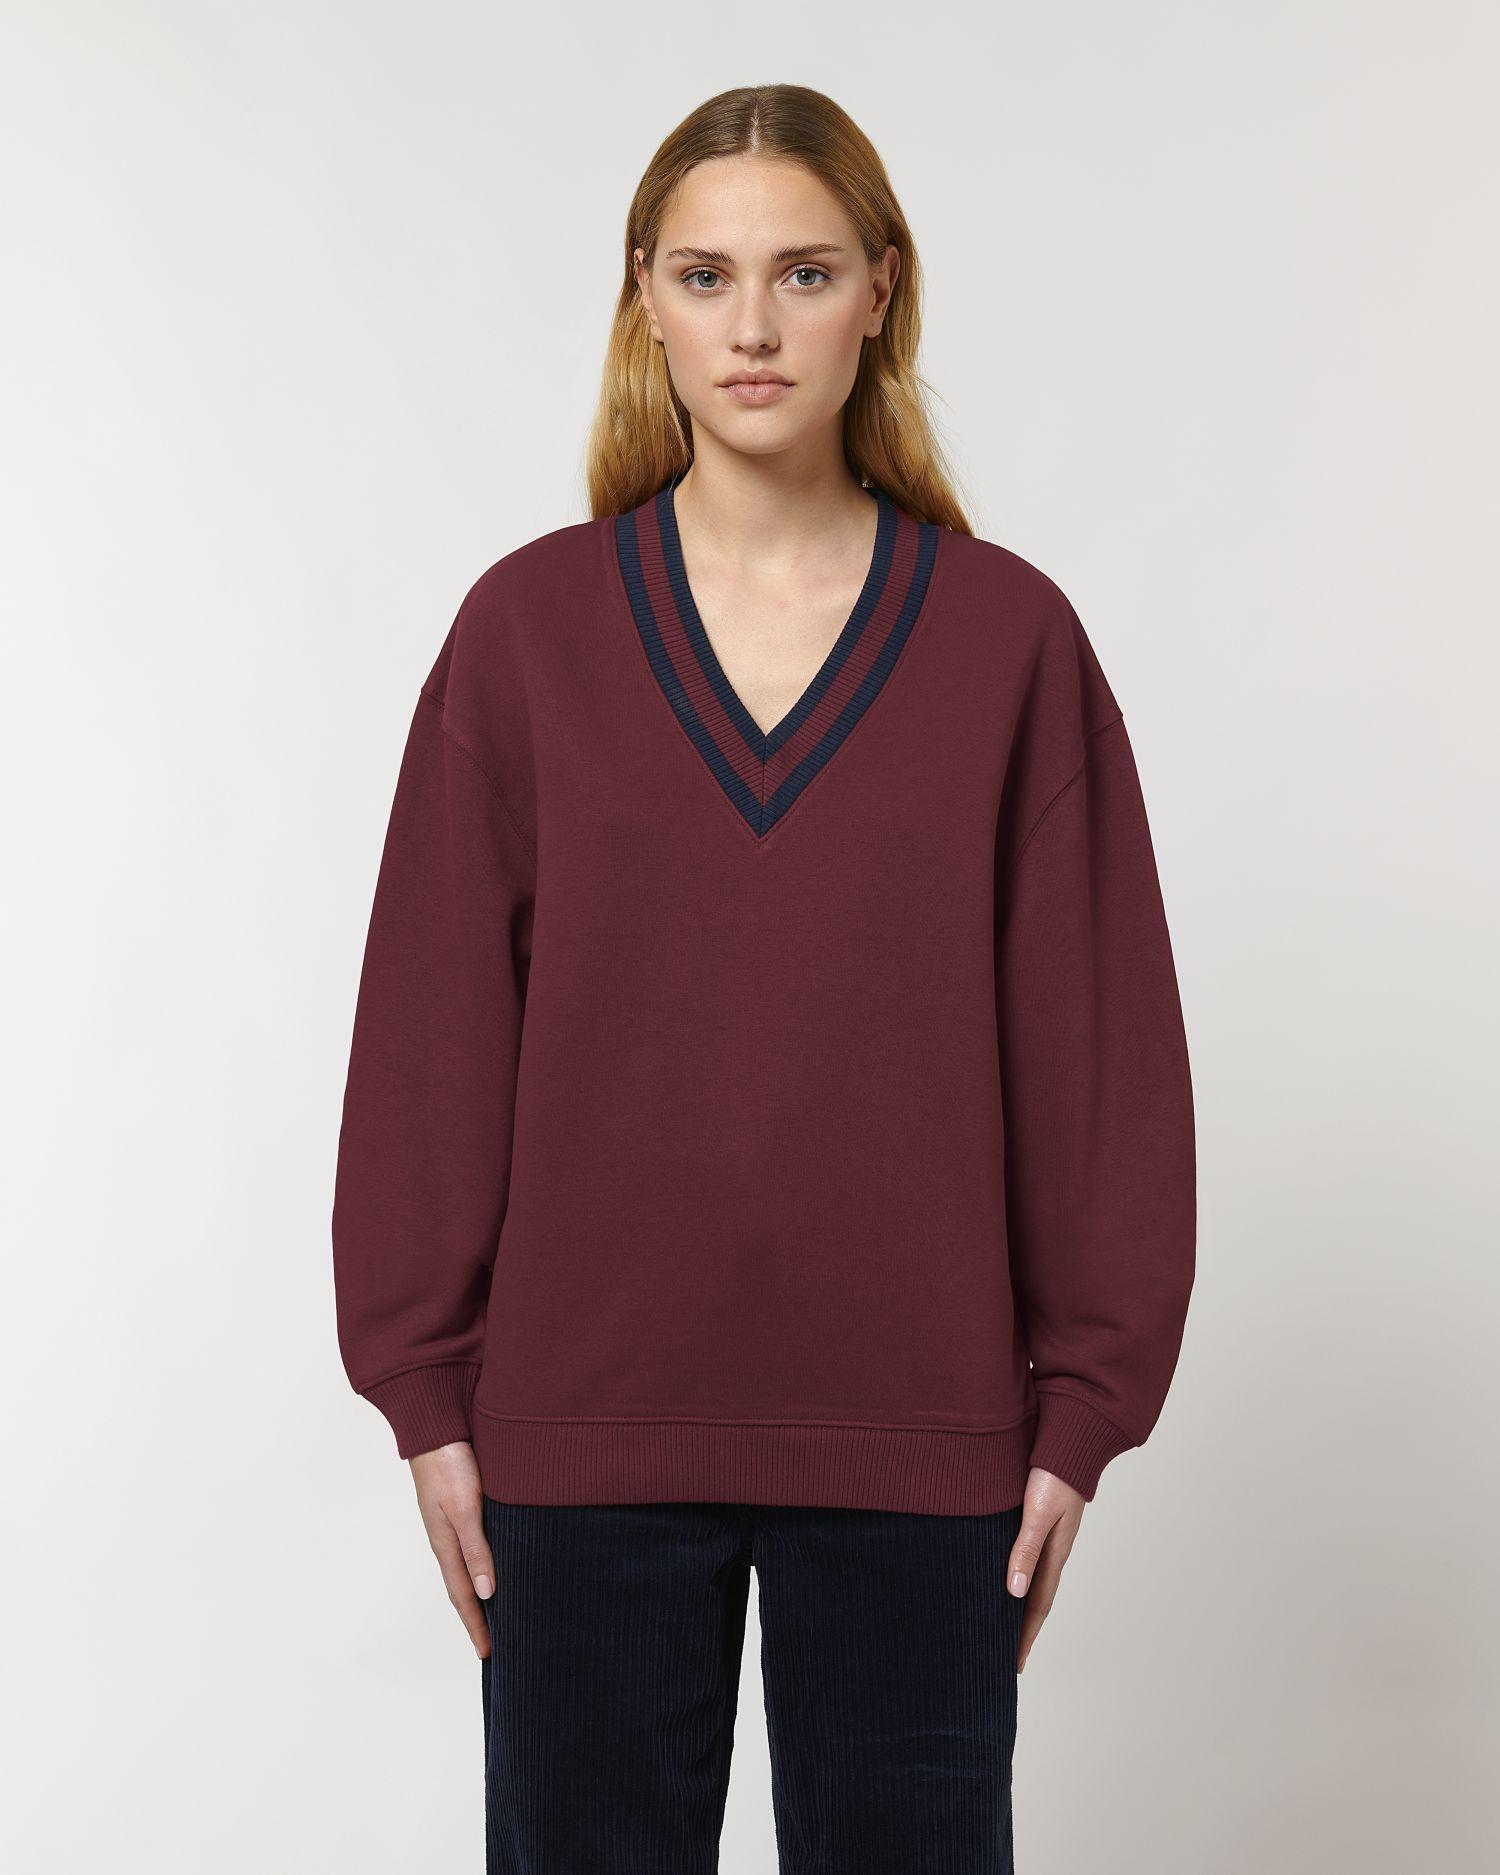 Sloaner Unisex V-Neck Sweatshirt STSU871 Stanley/Stella